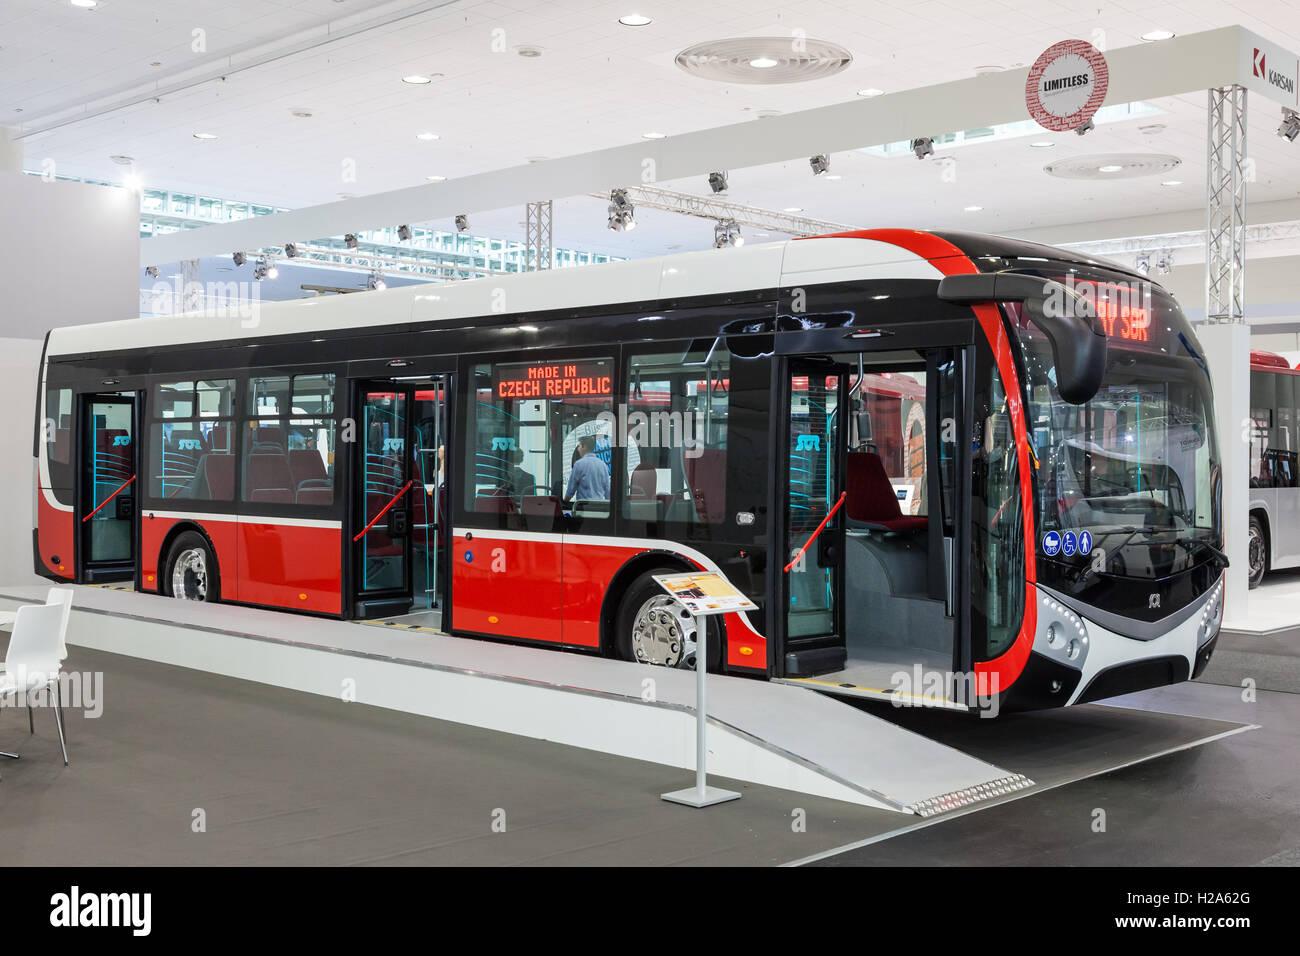 Czechpany Sor Electric Bus  Stock Image